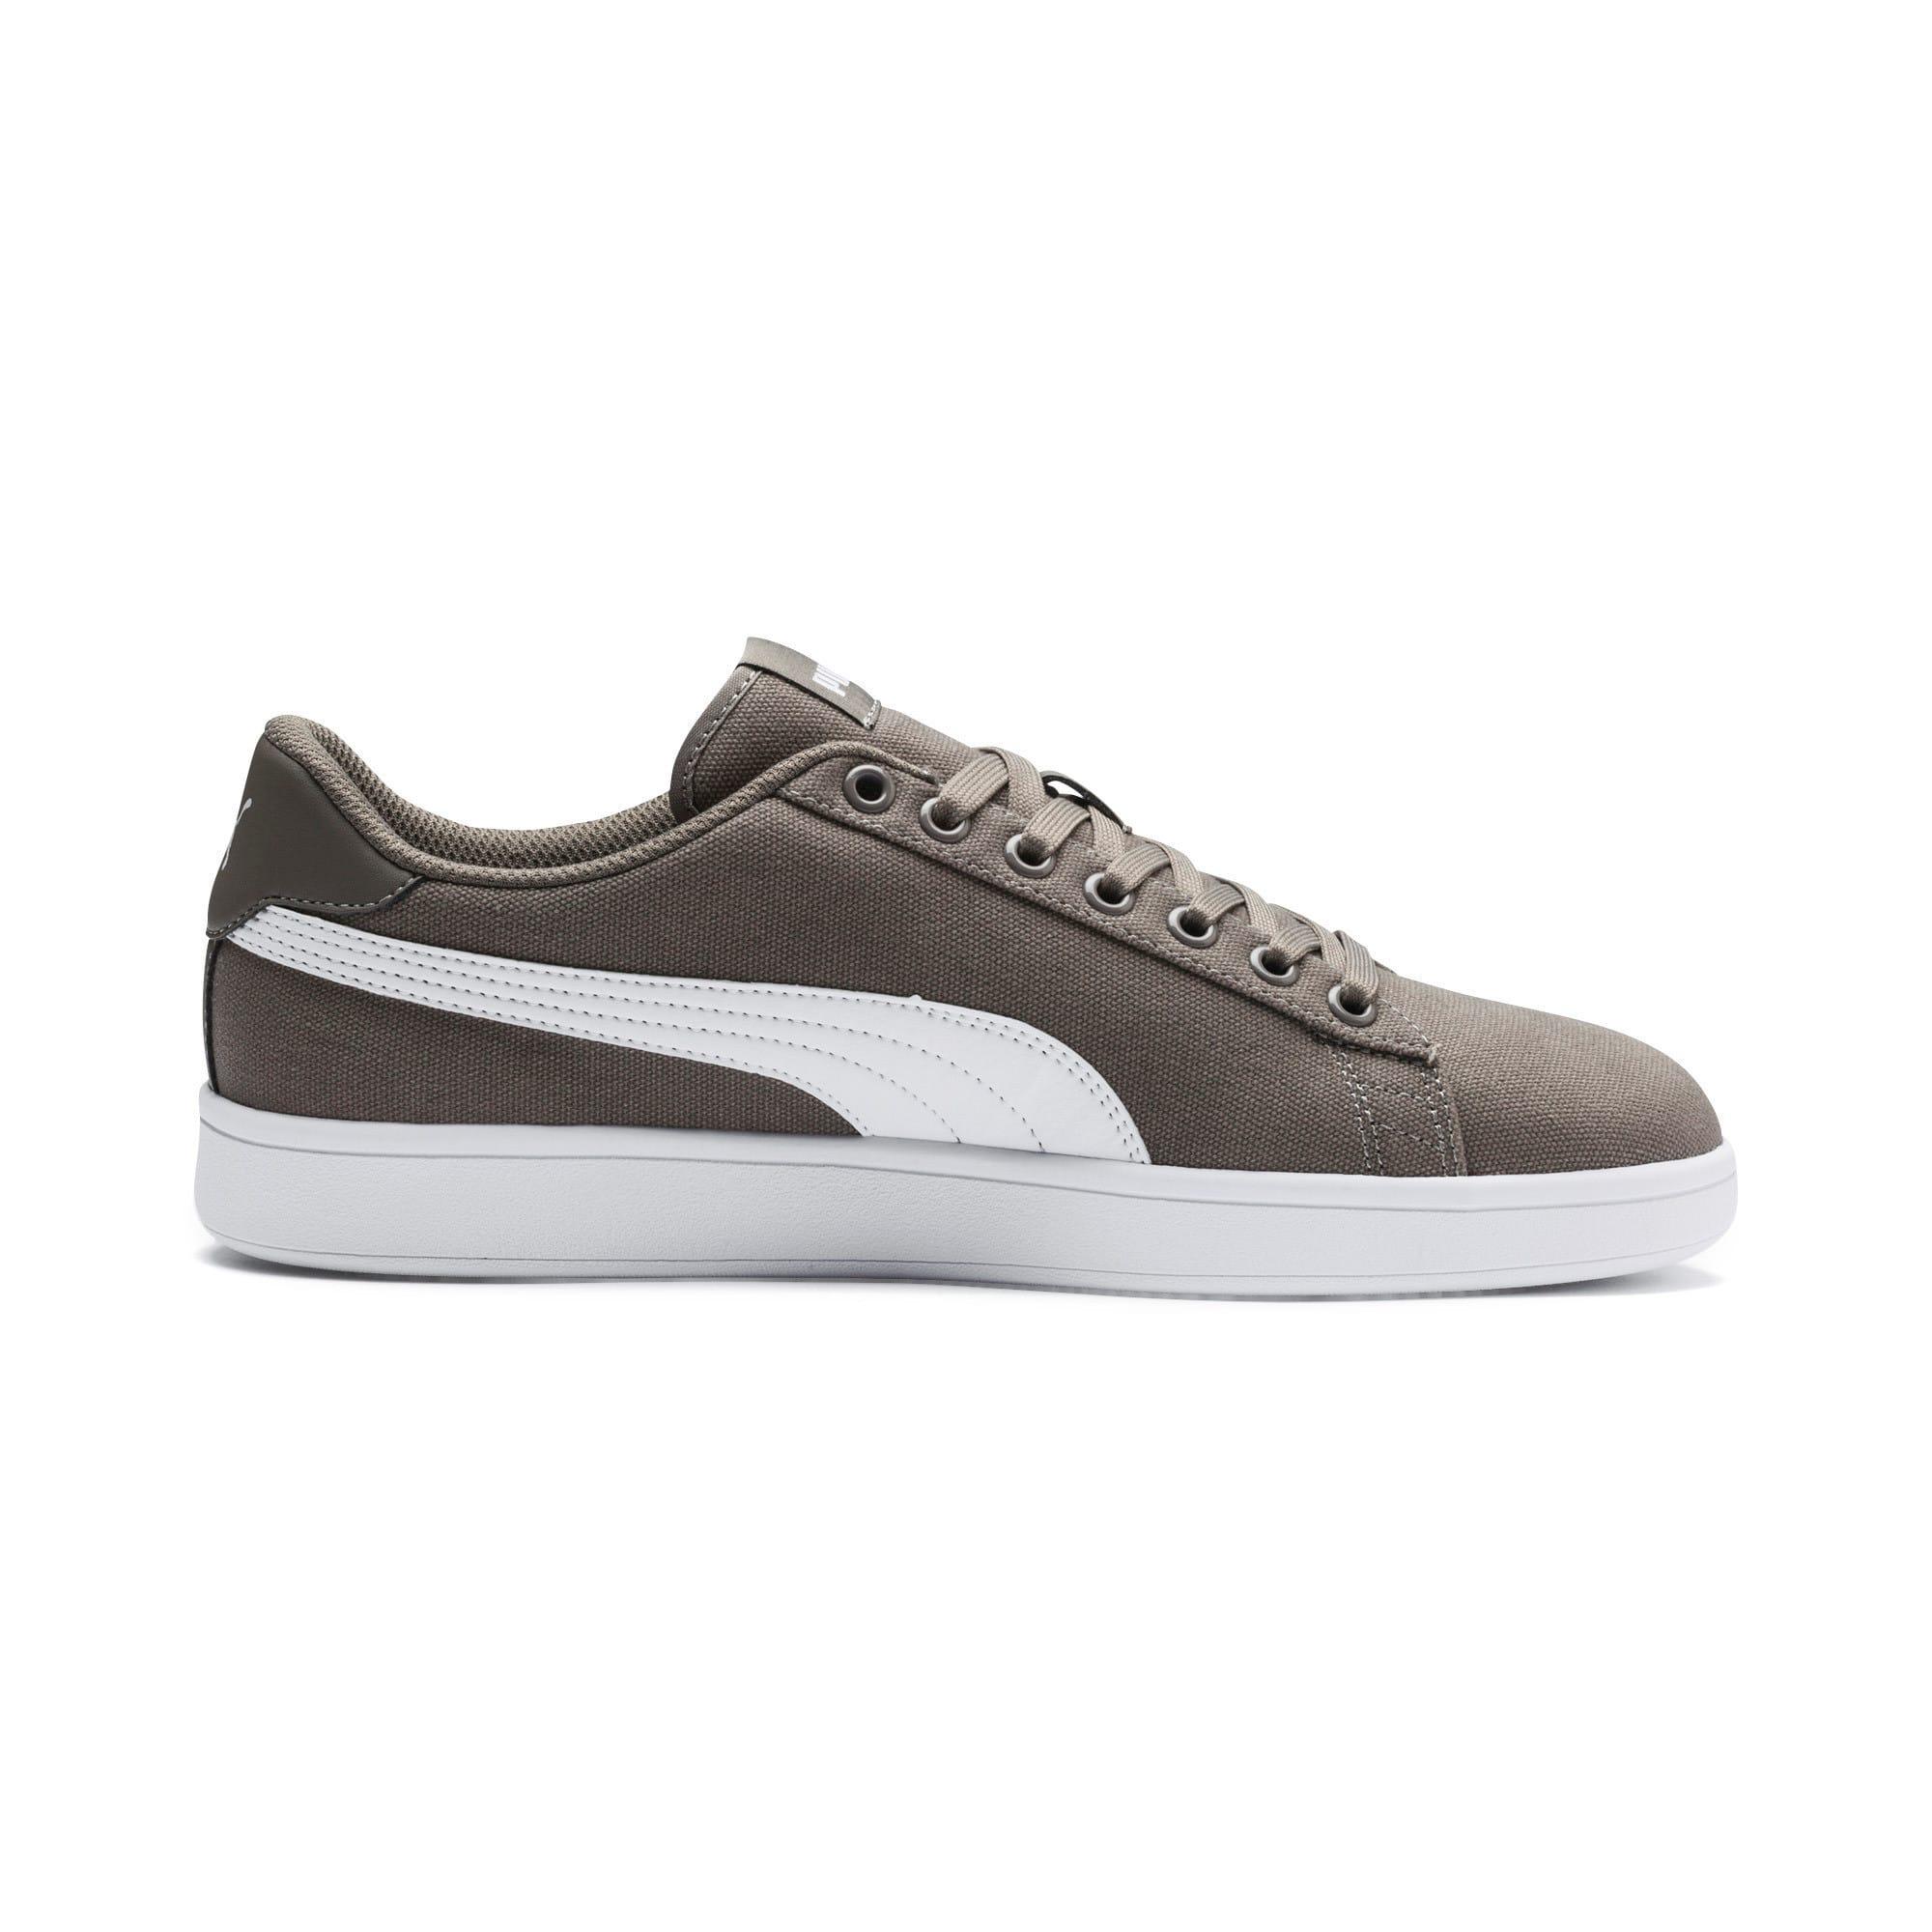 Thumbnail 5 of PUMA Smash v2 Sneakers, Charcoal Gray-Puma White, medium-IND